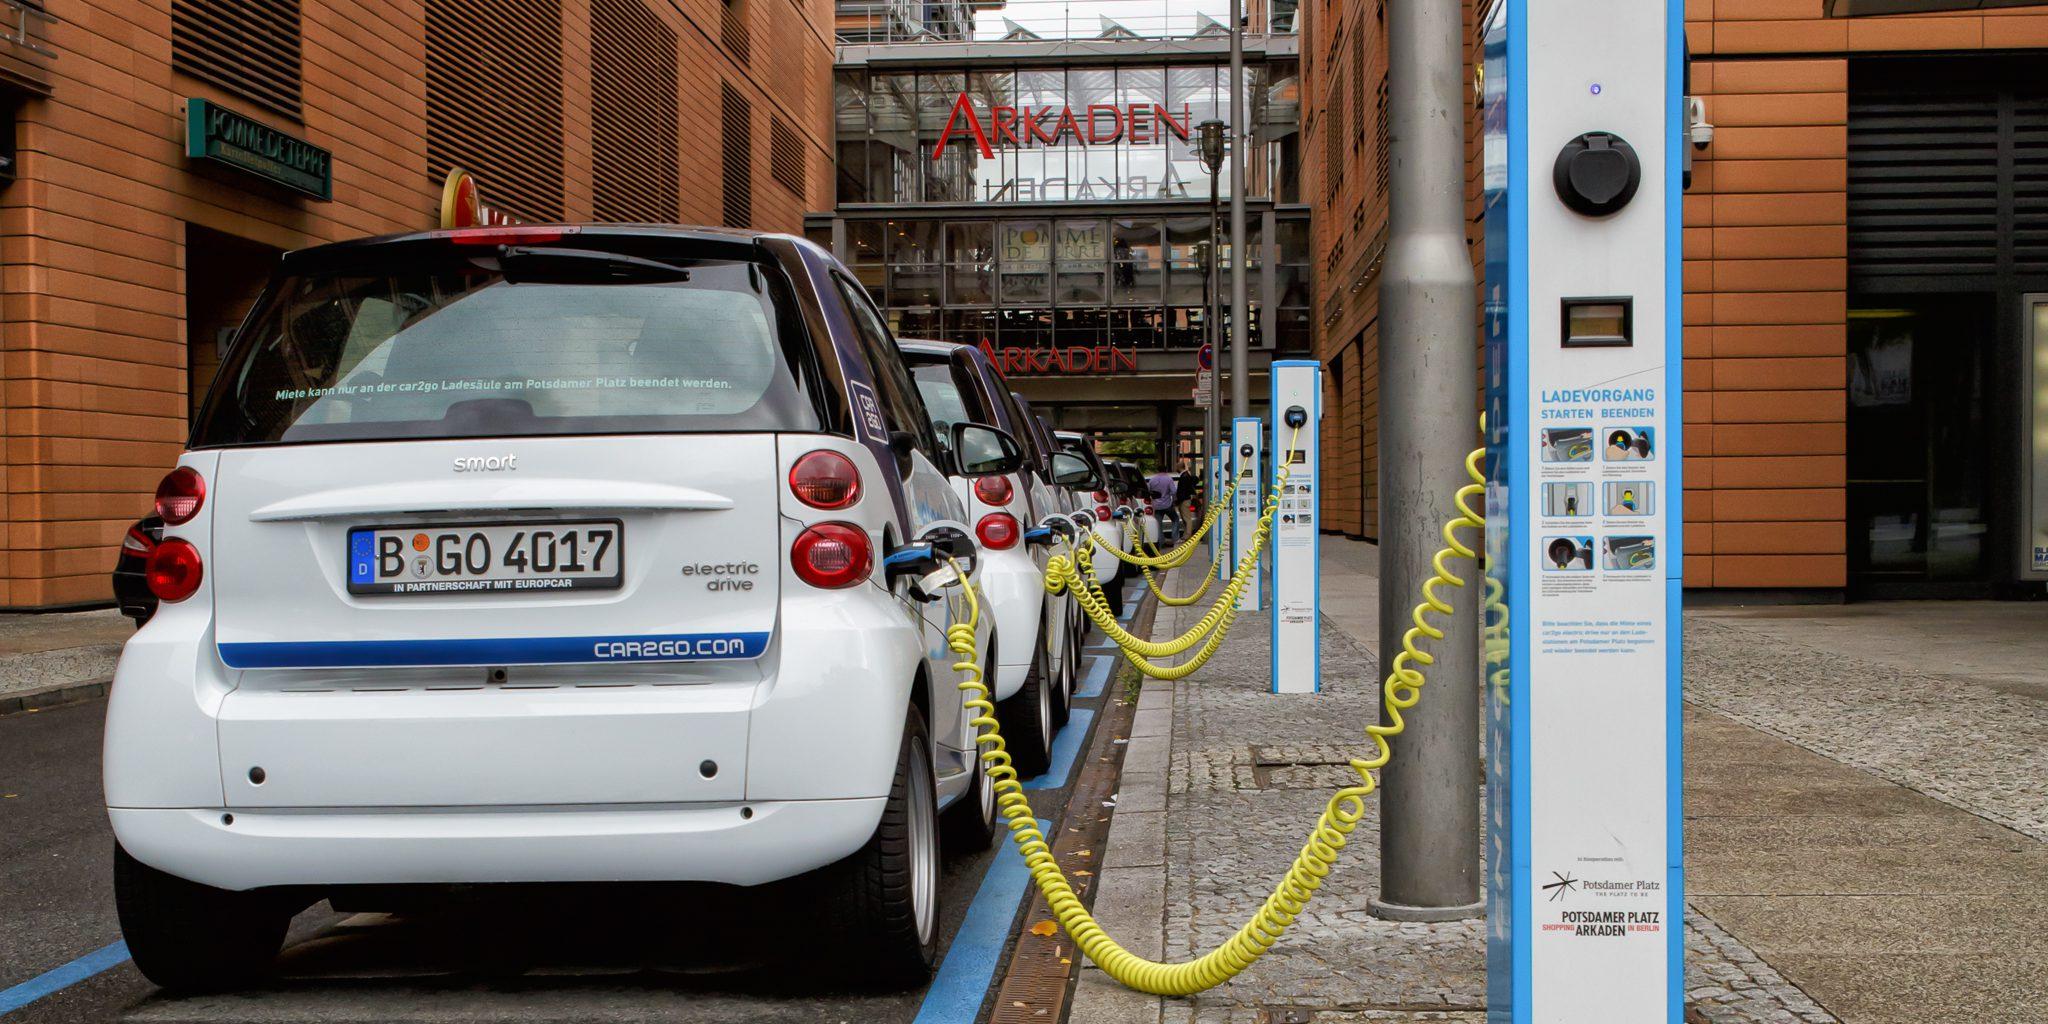 Berlin_-_Potsdamer_Platz_-_E-Mobility-Charging